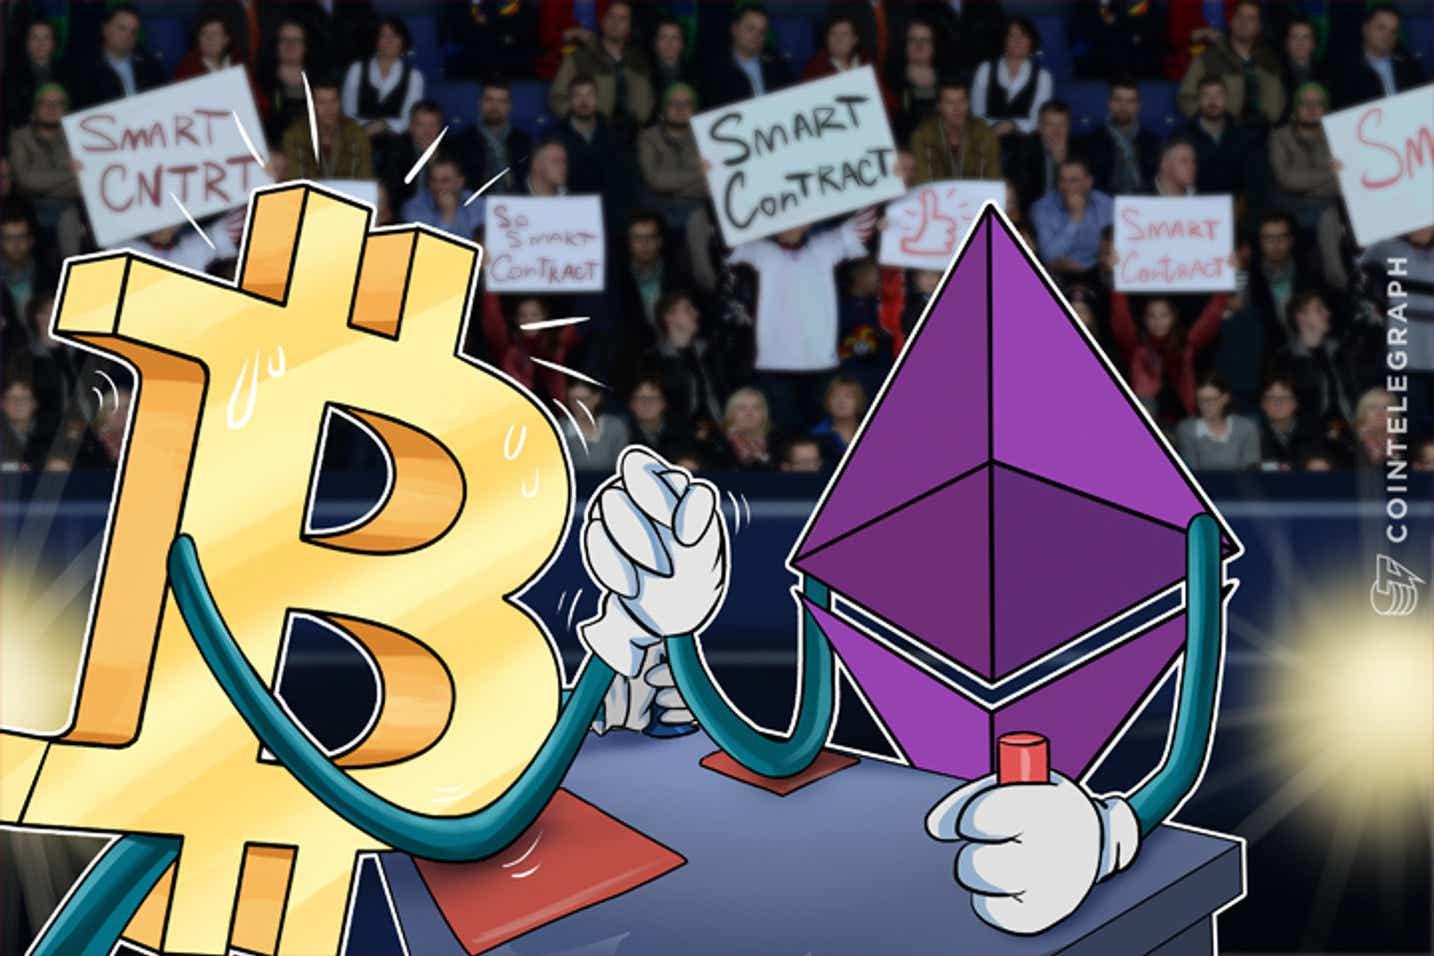 Ethereum gana cuota de mercado frente a Bitcoin